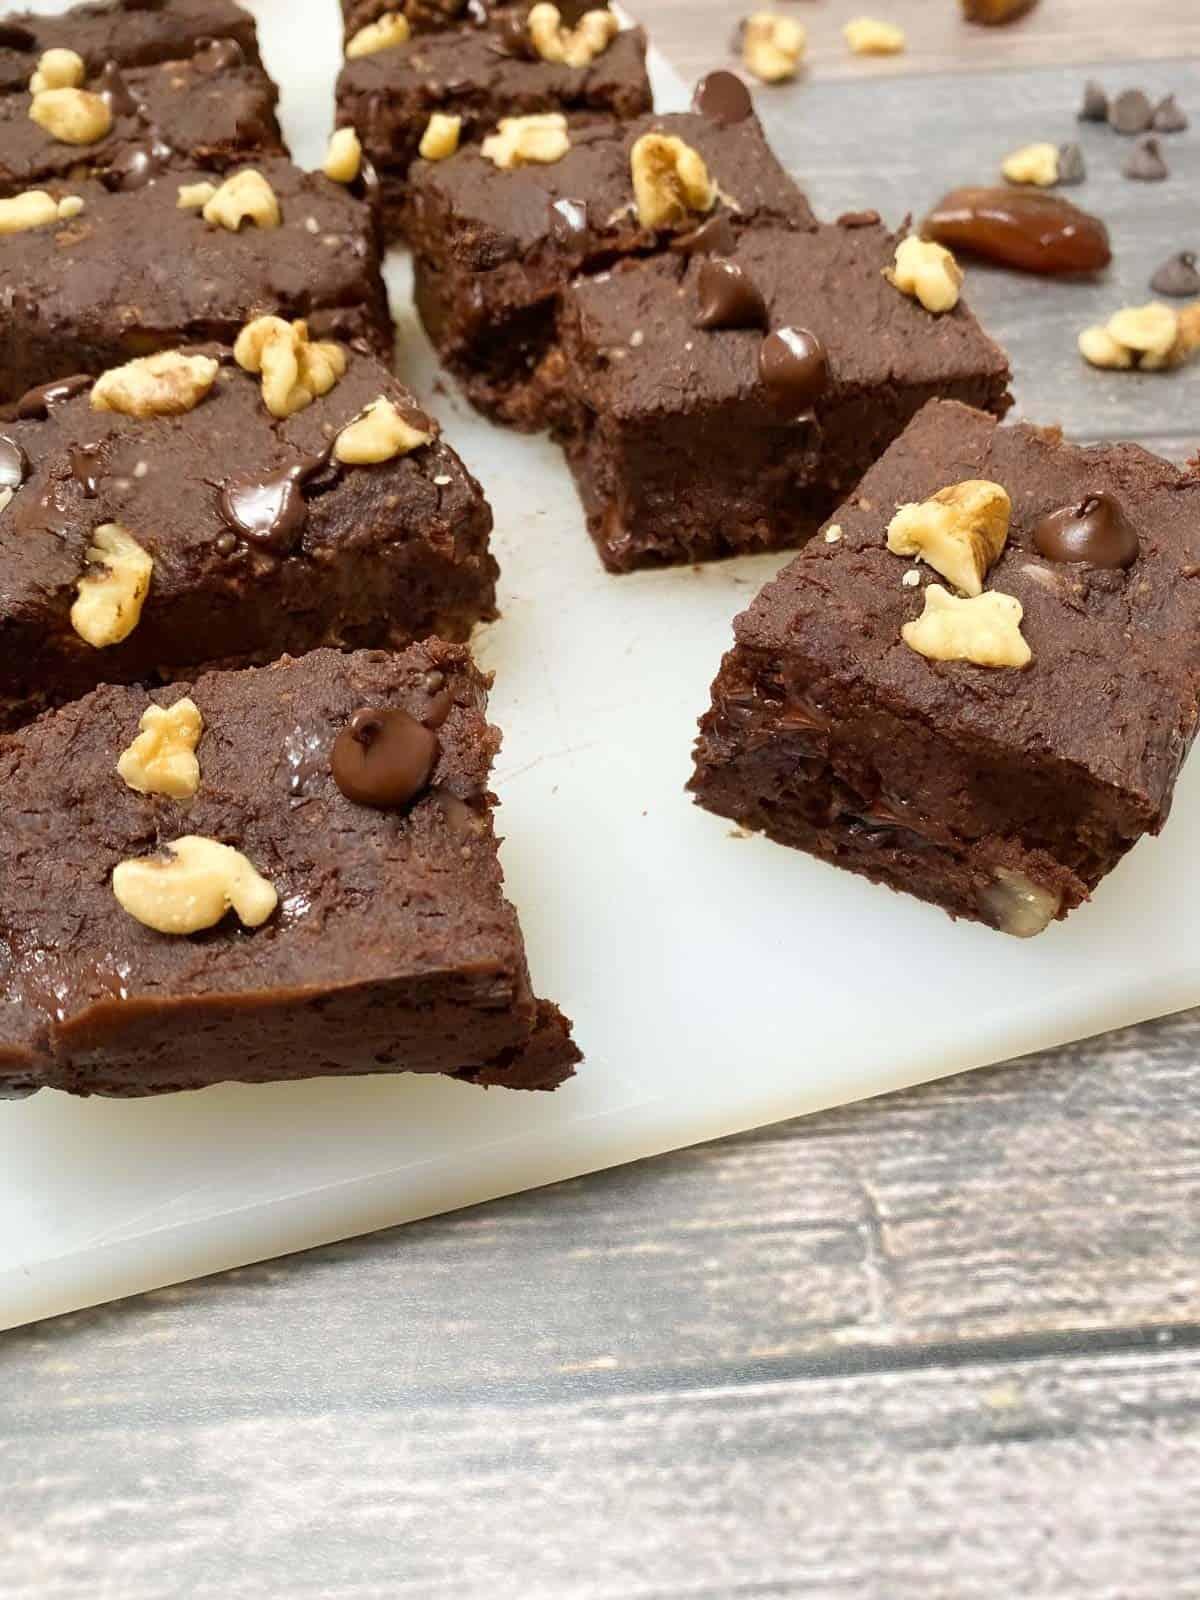 vegan brownies on cutting board with walnuts on top